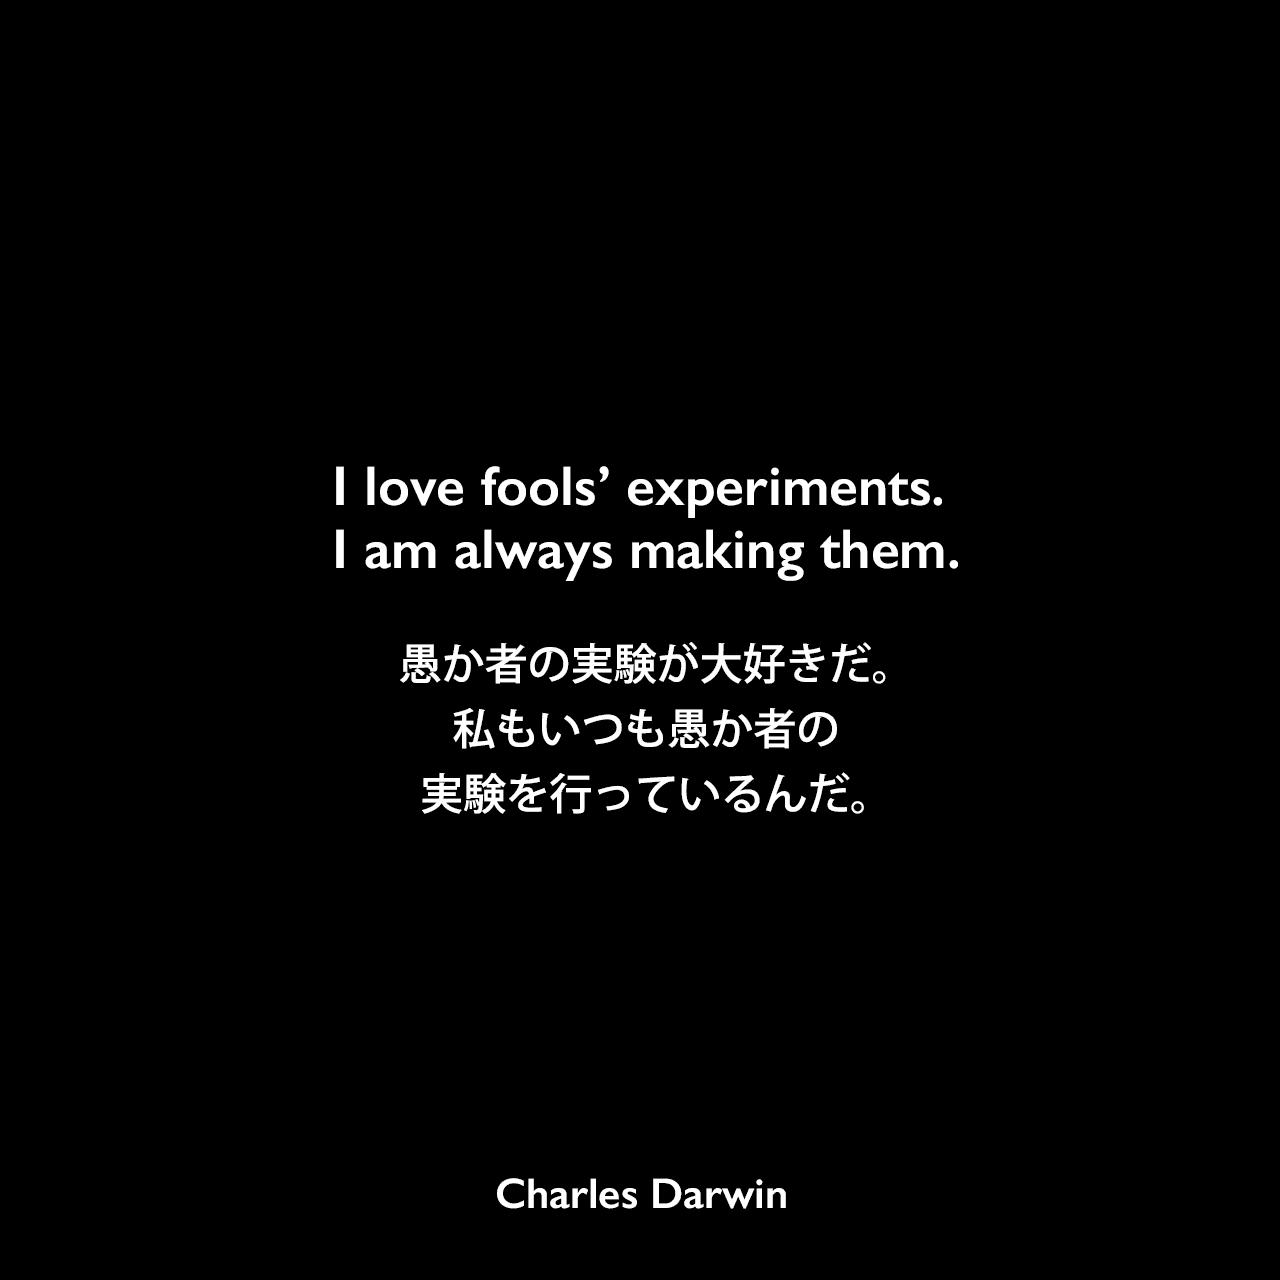 I love fools' experiments. I am always making them.愚か者の実験が大好きだ。私もいつも愚か者の実験を行っているんだ。- レイ・ランケスターのエッセイ「Charles Robert Darwin」よりCharles Darwin